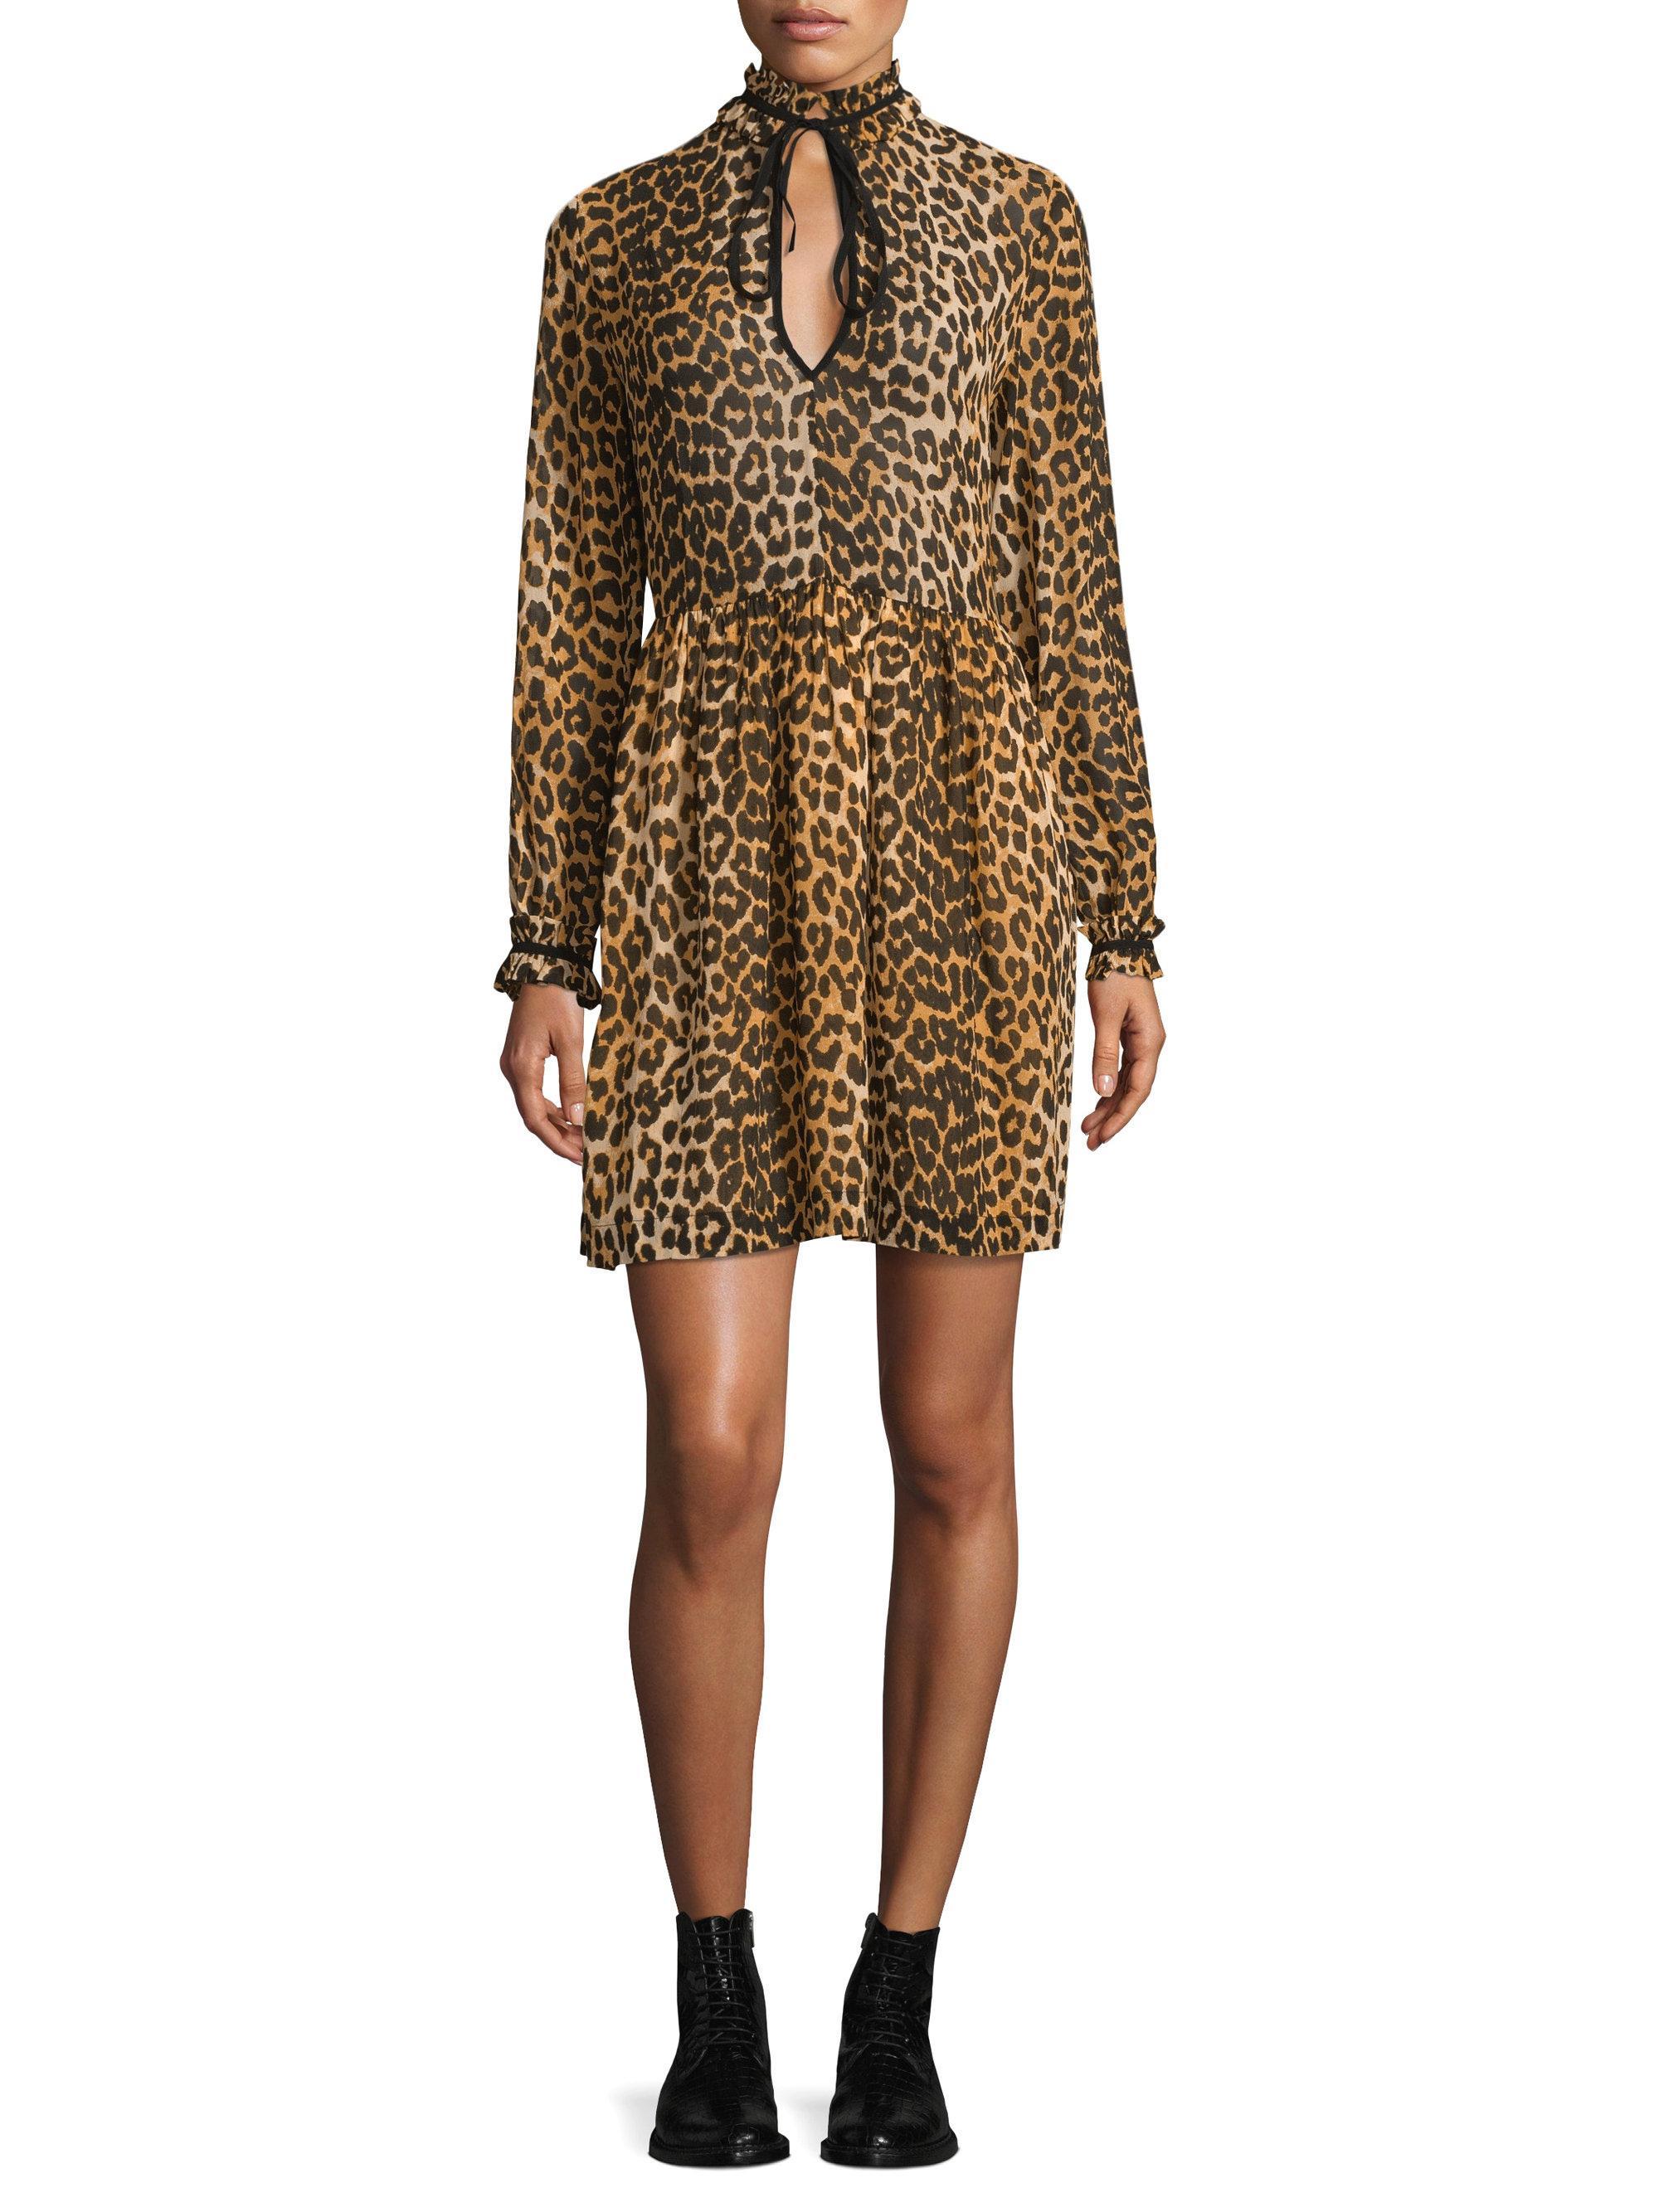 Ganni Fairfax Georgette Leopard Dress Lyst